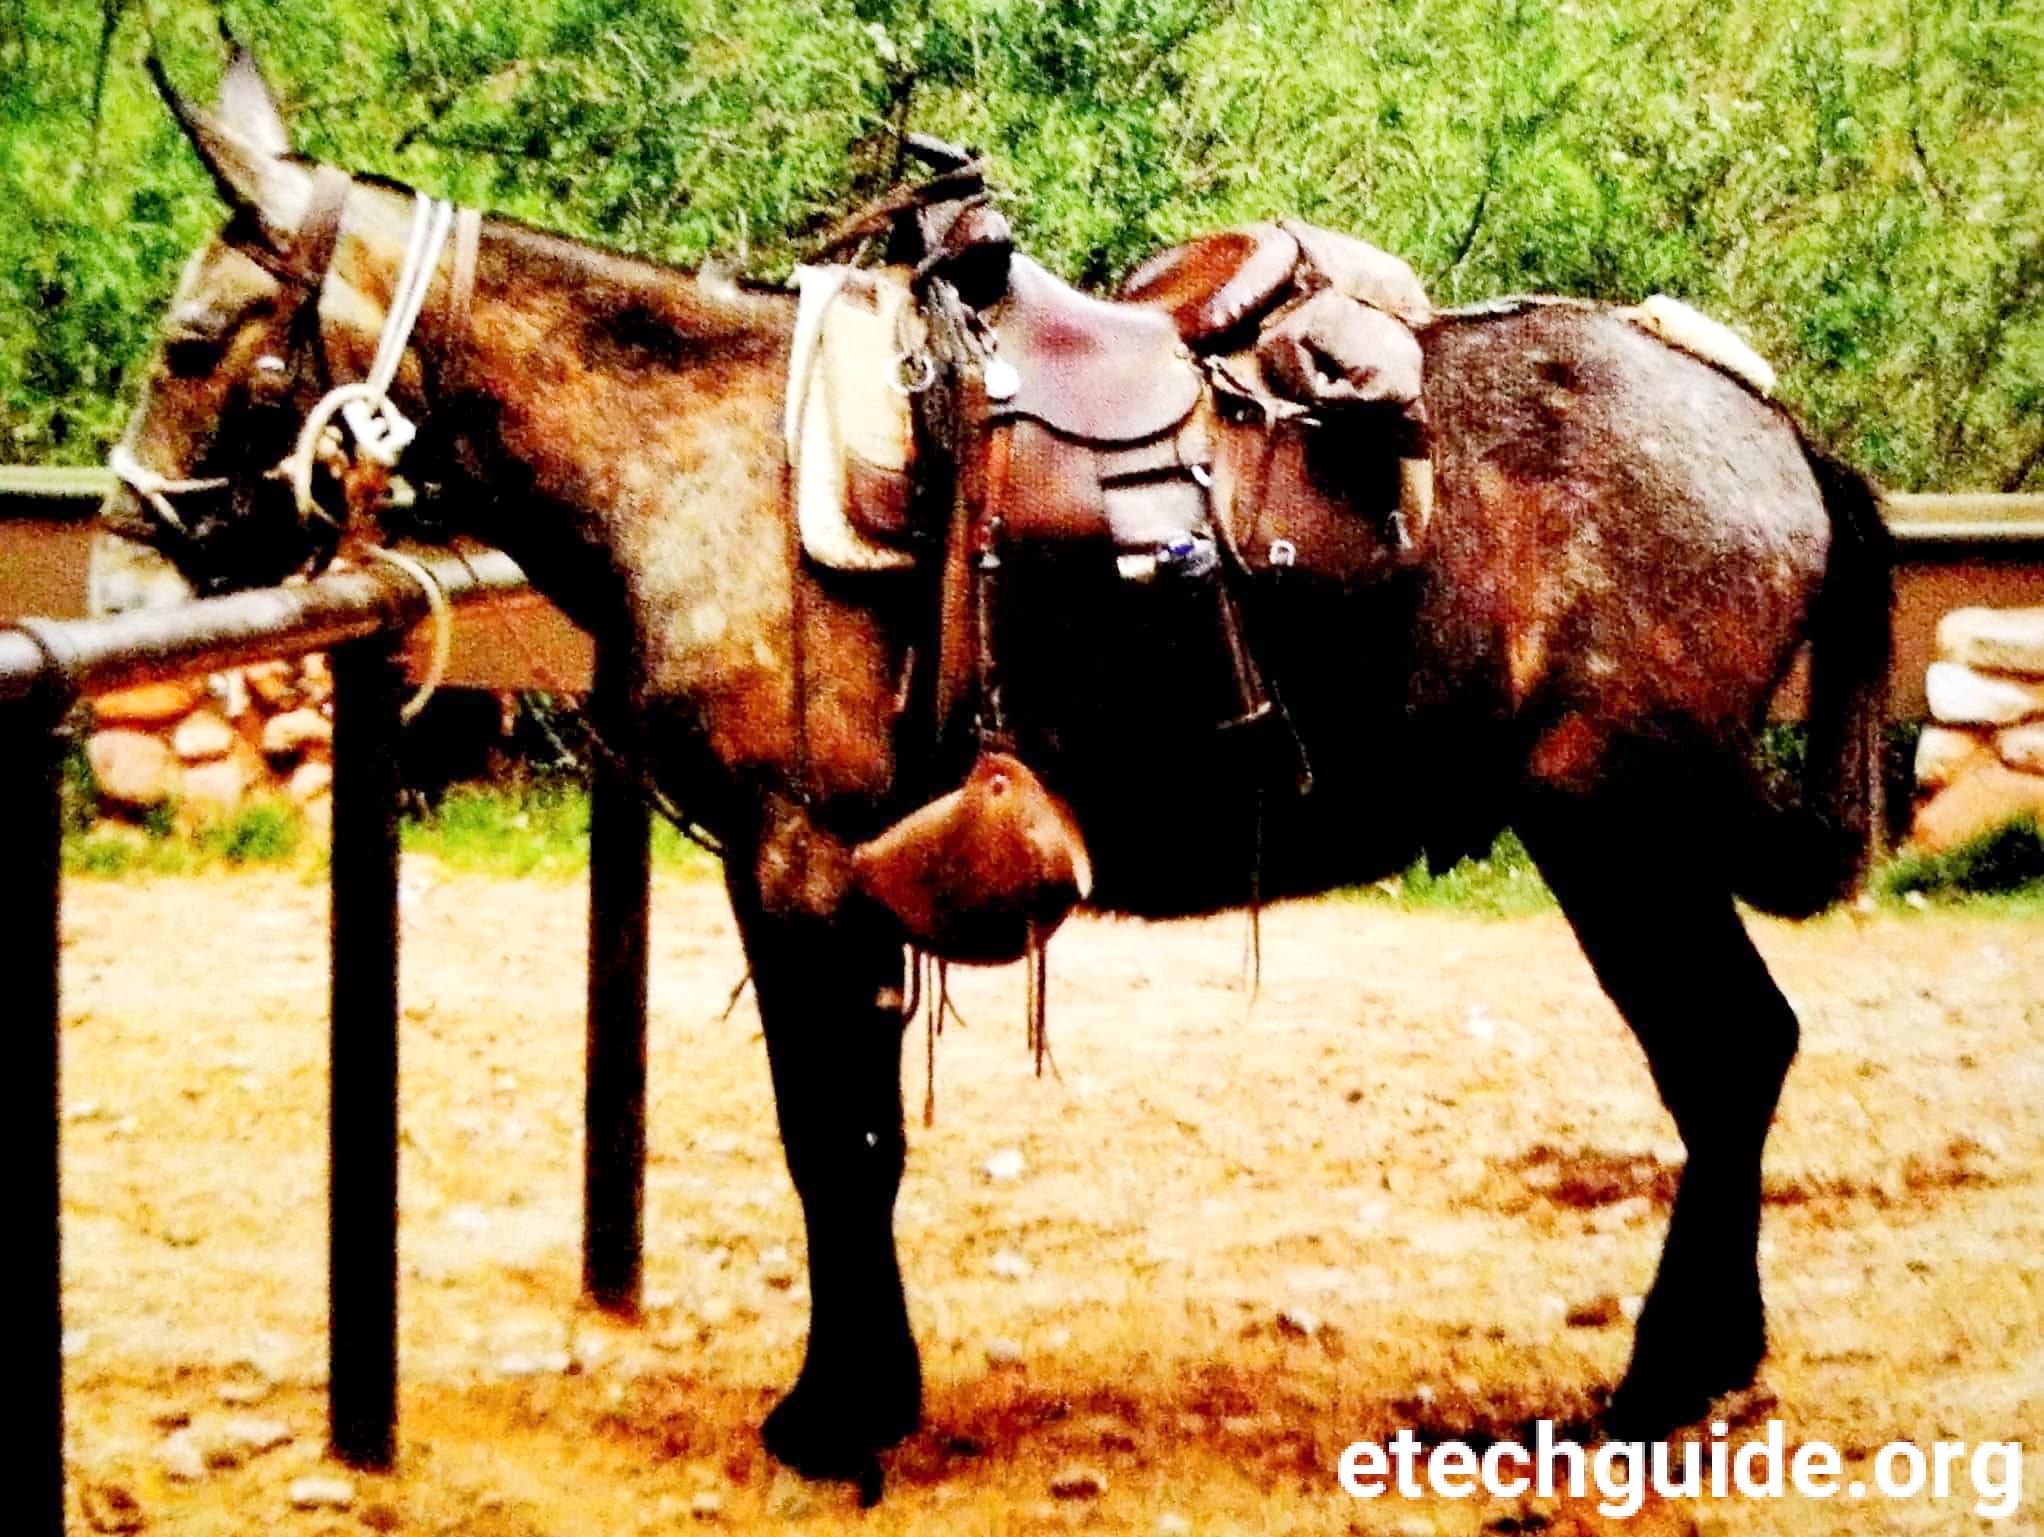 Farm Animals-Donkeys and Mules